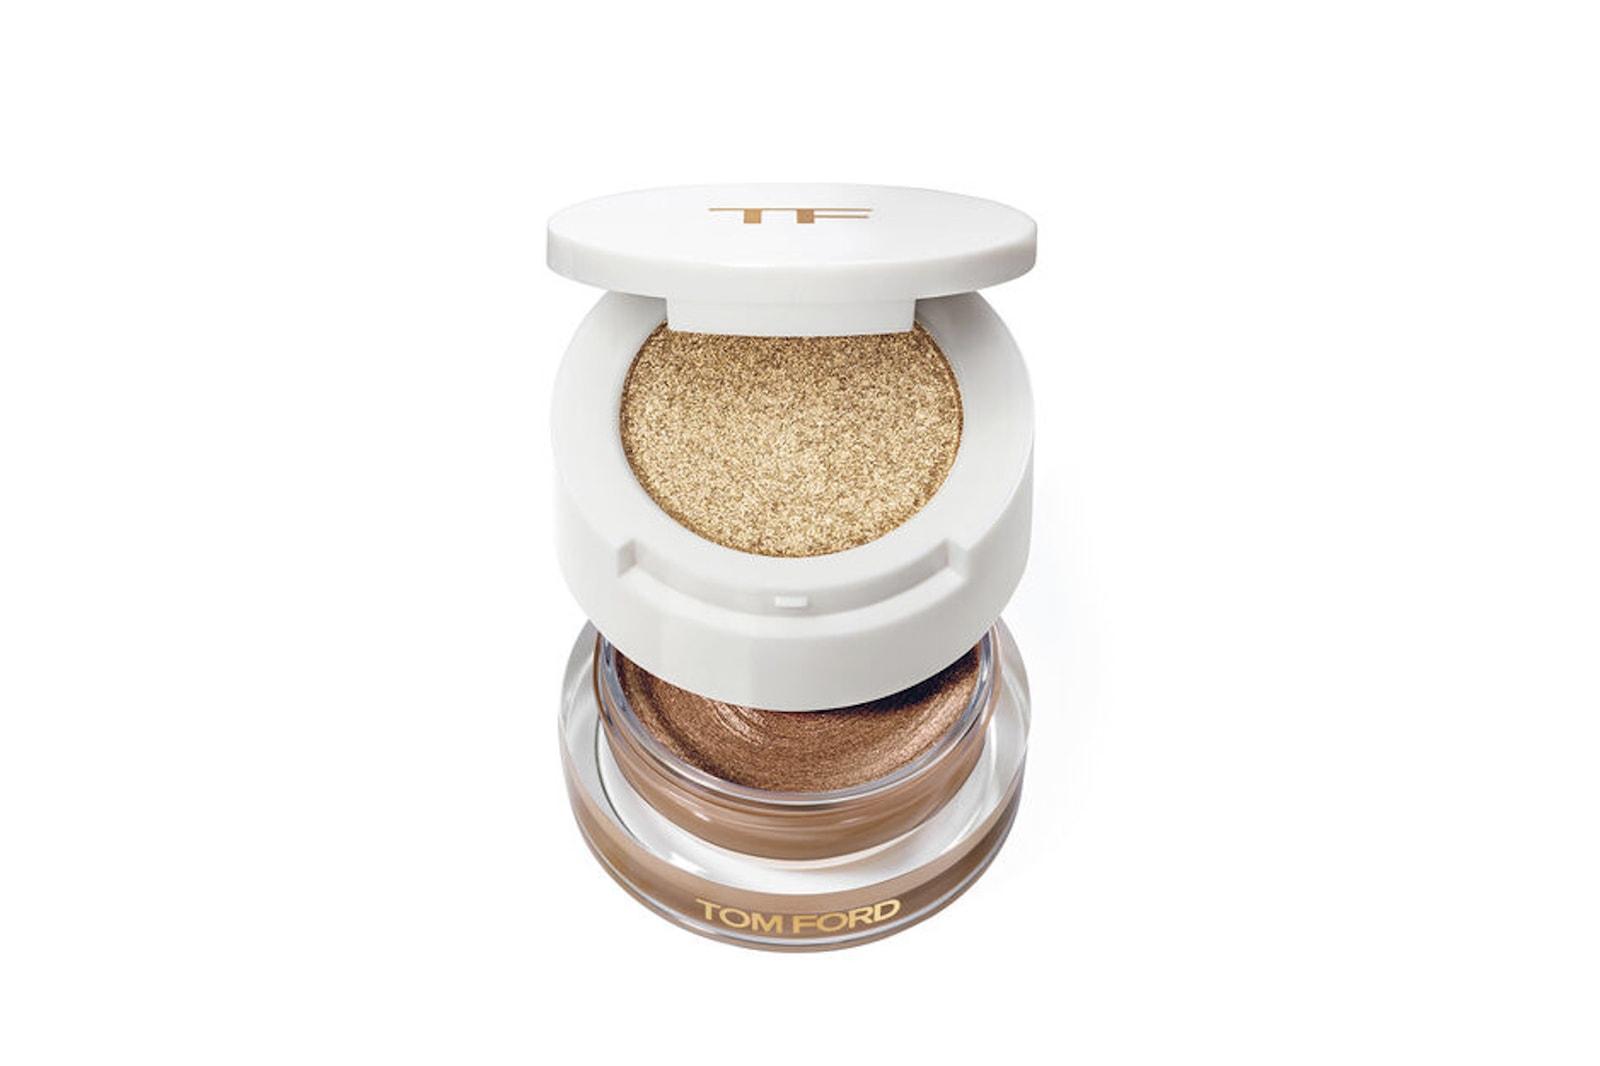 Best Cream Eye Shadows Milk Makeup Mac Cosmetics Charlotte Tilbury Beauty Eyes Easy Makeup Tom Ford RMS Hourglass